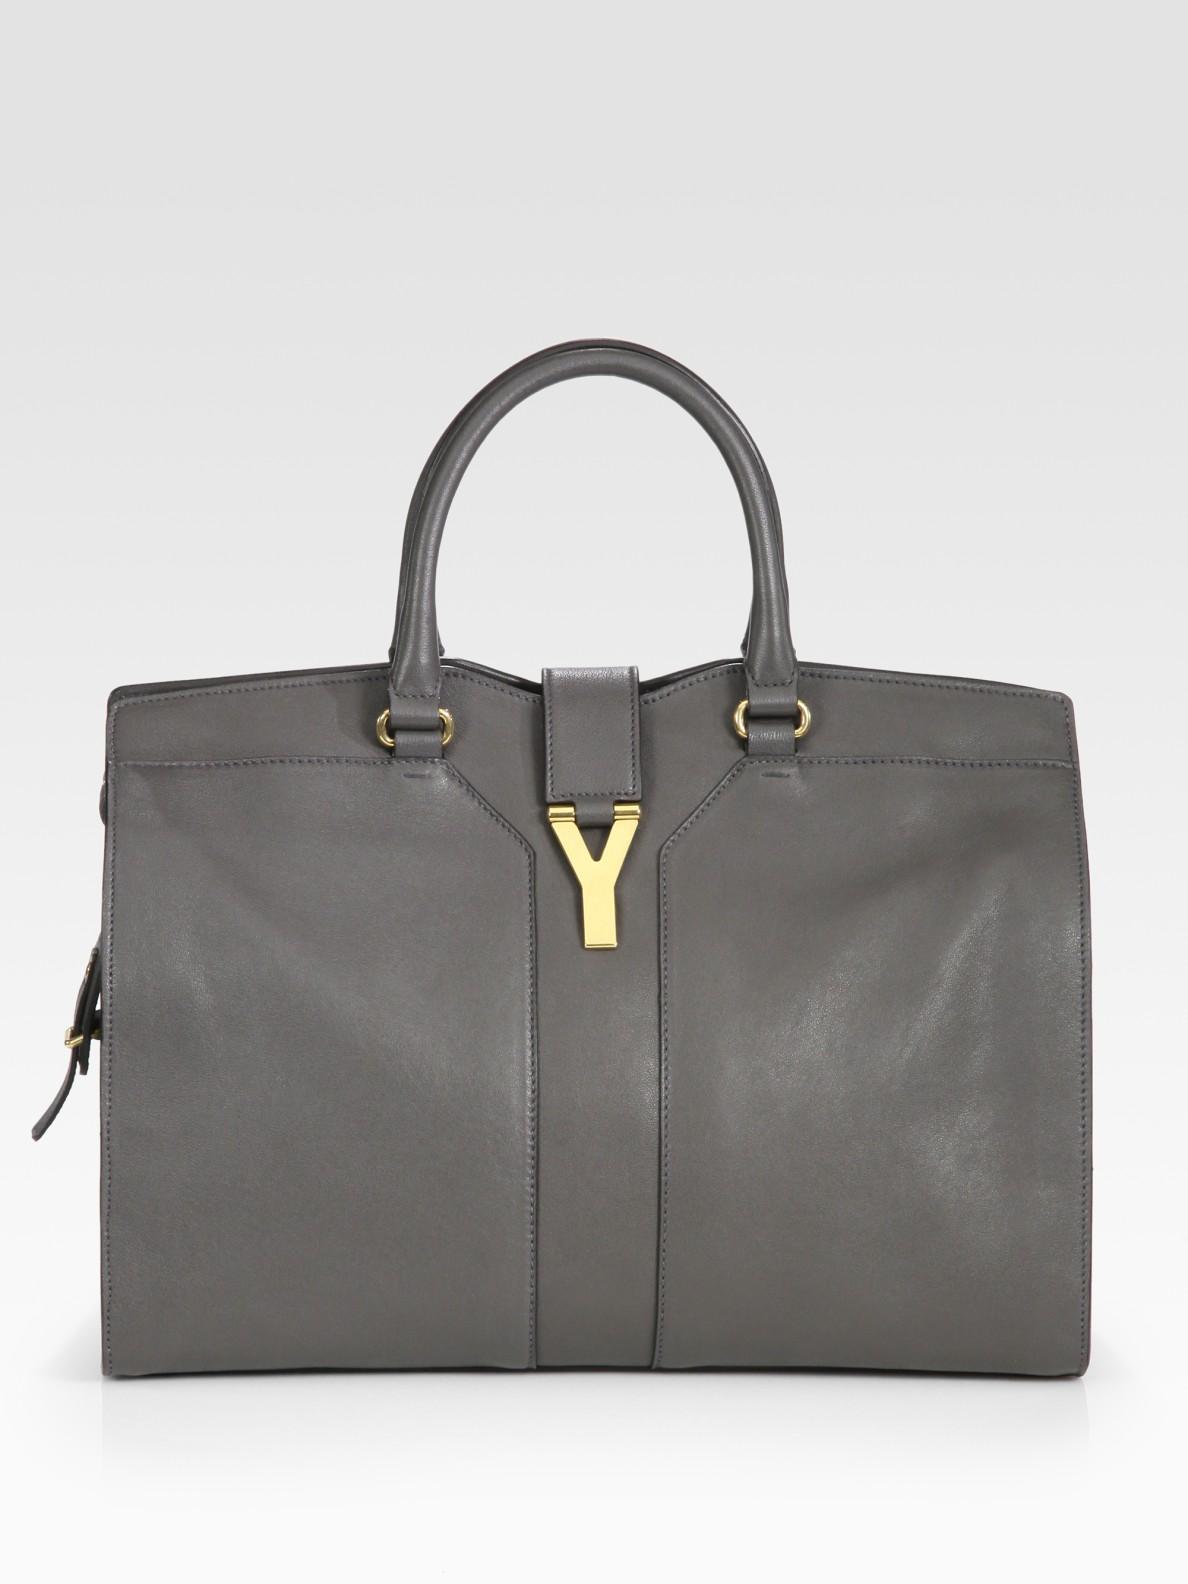 ysl handbag cabas chyc